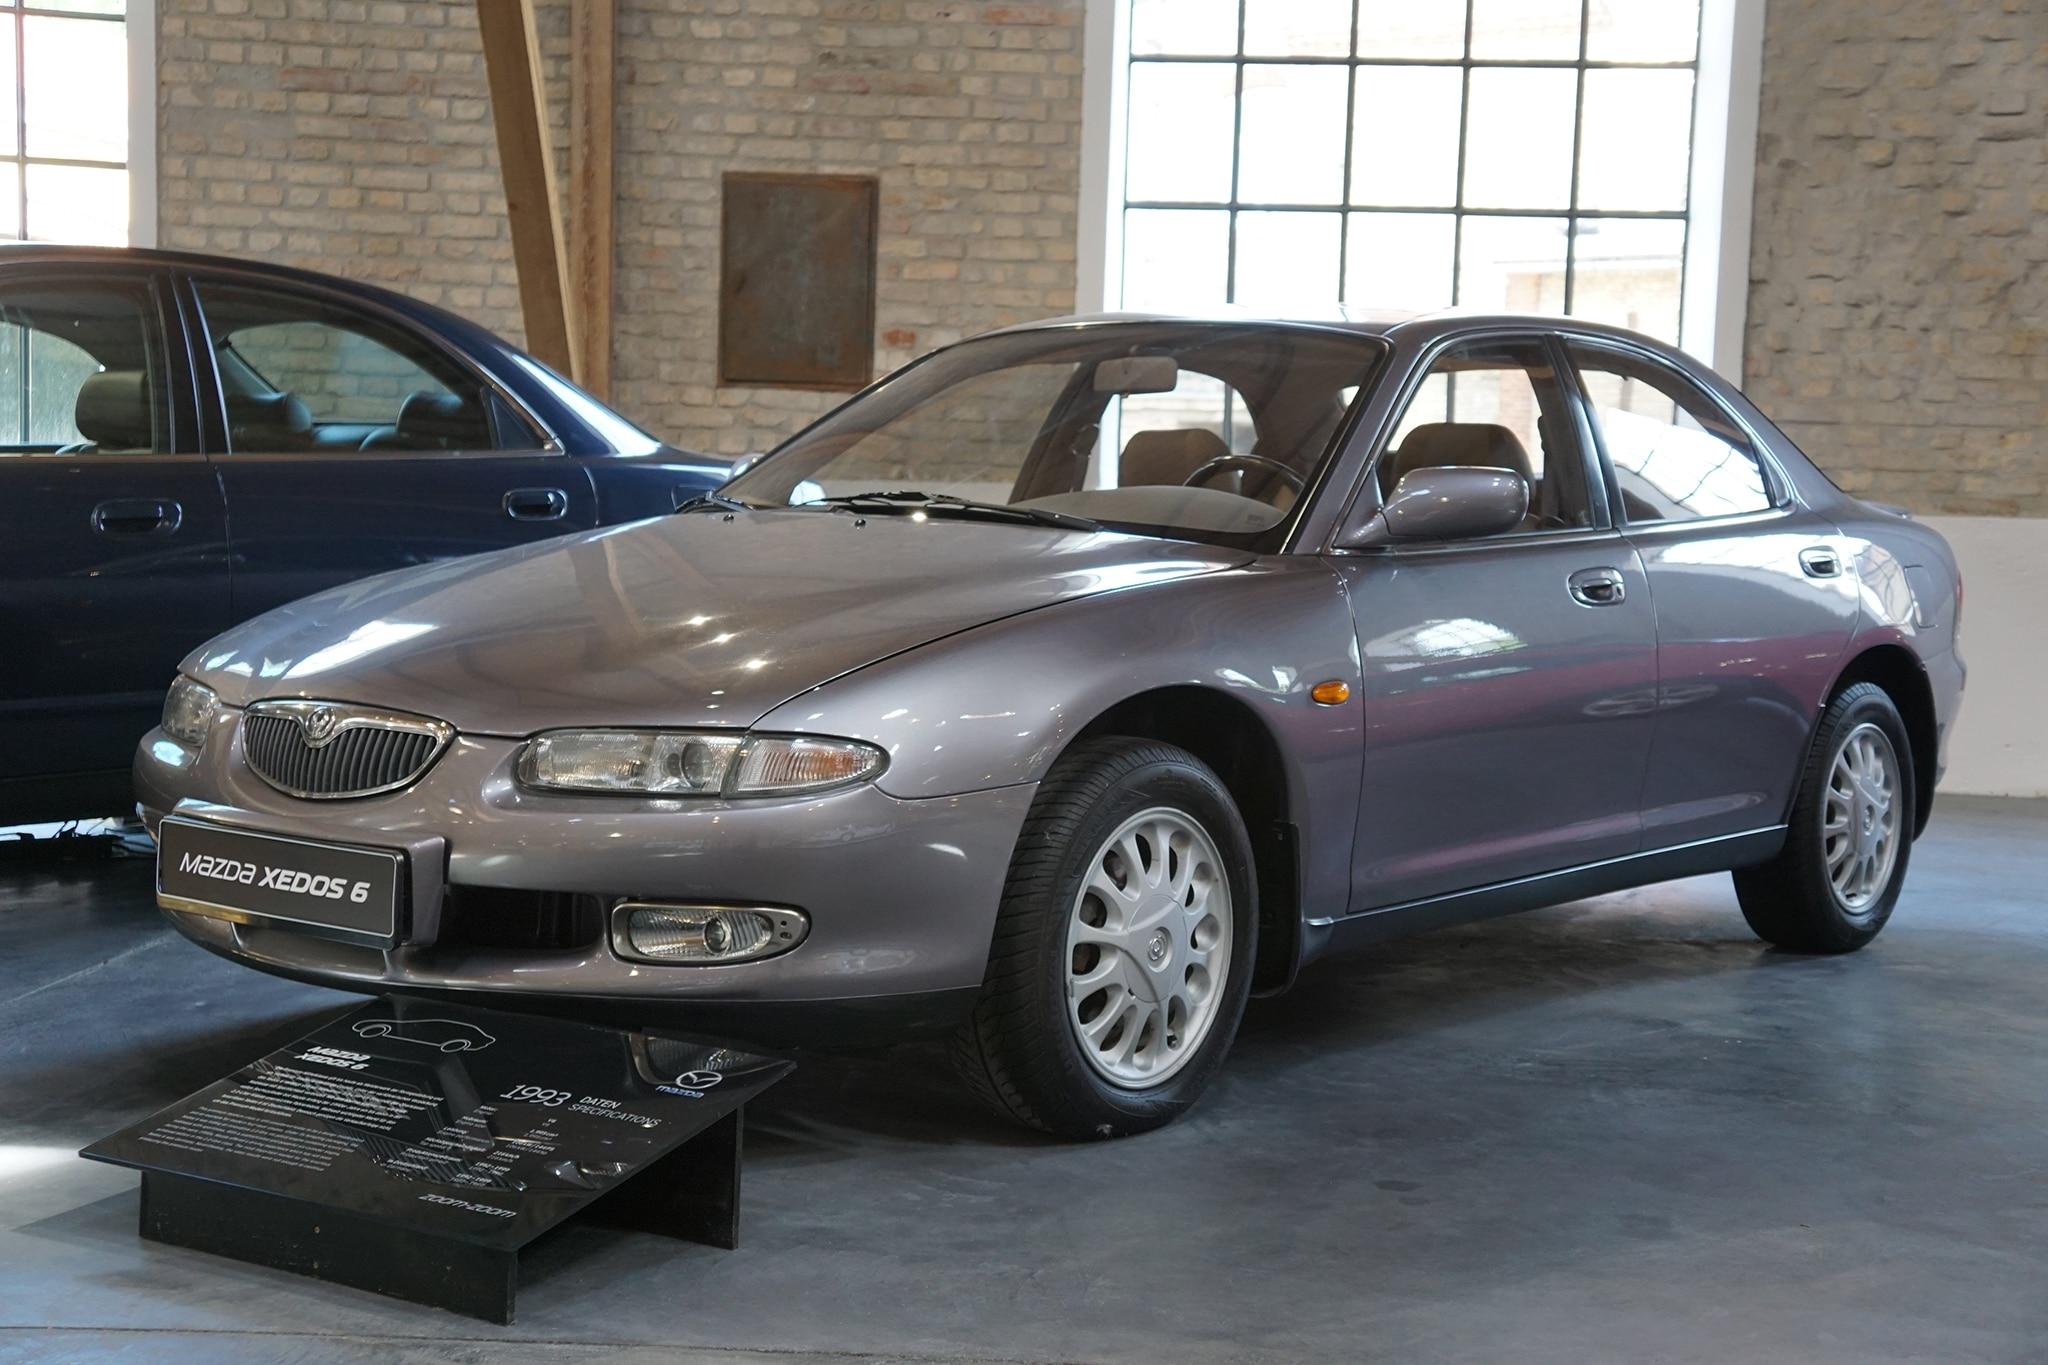 Twenty Cool Cars from Frey's Mazda Classic Car Museum